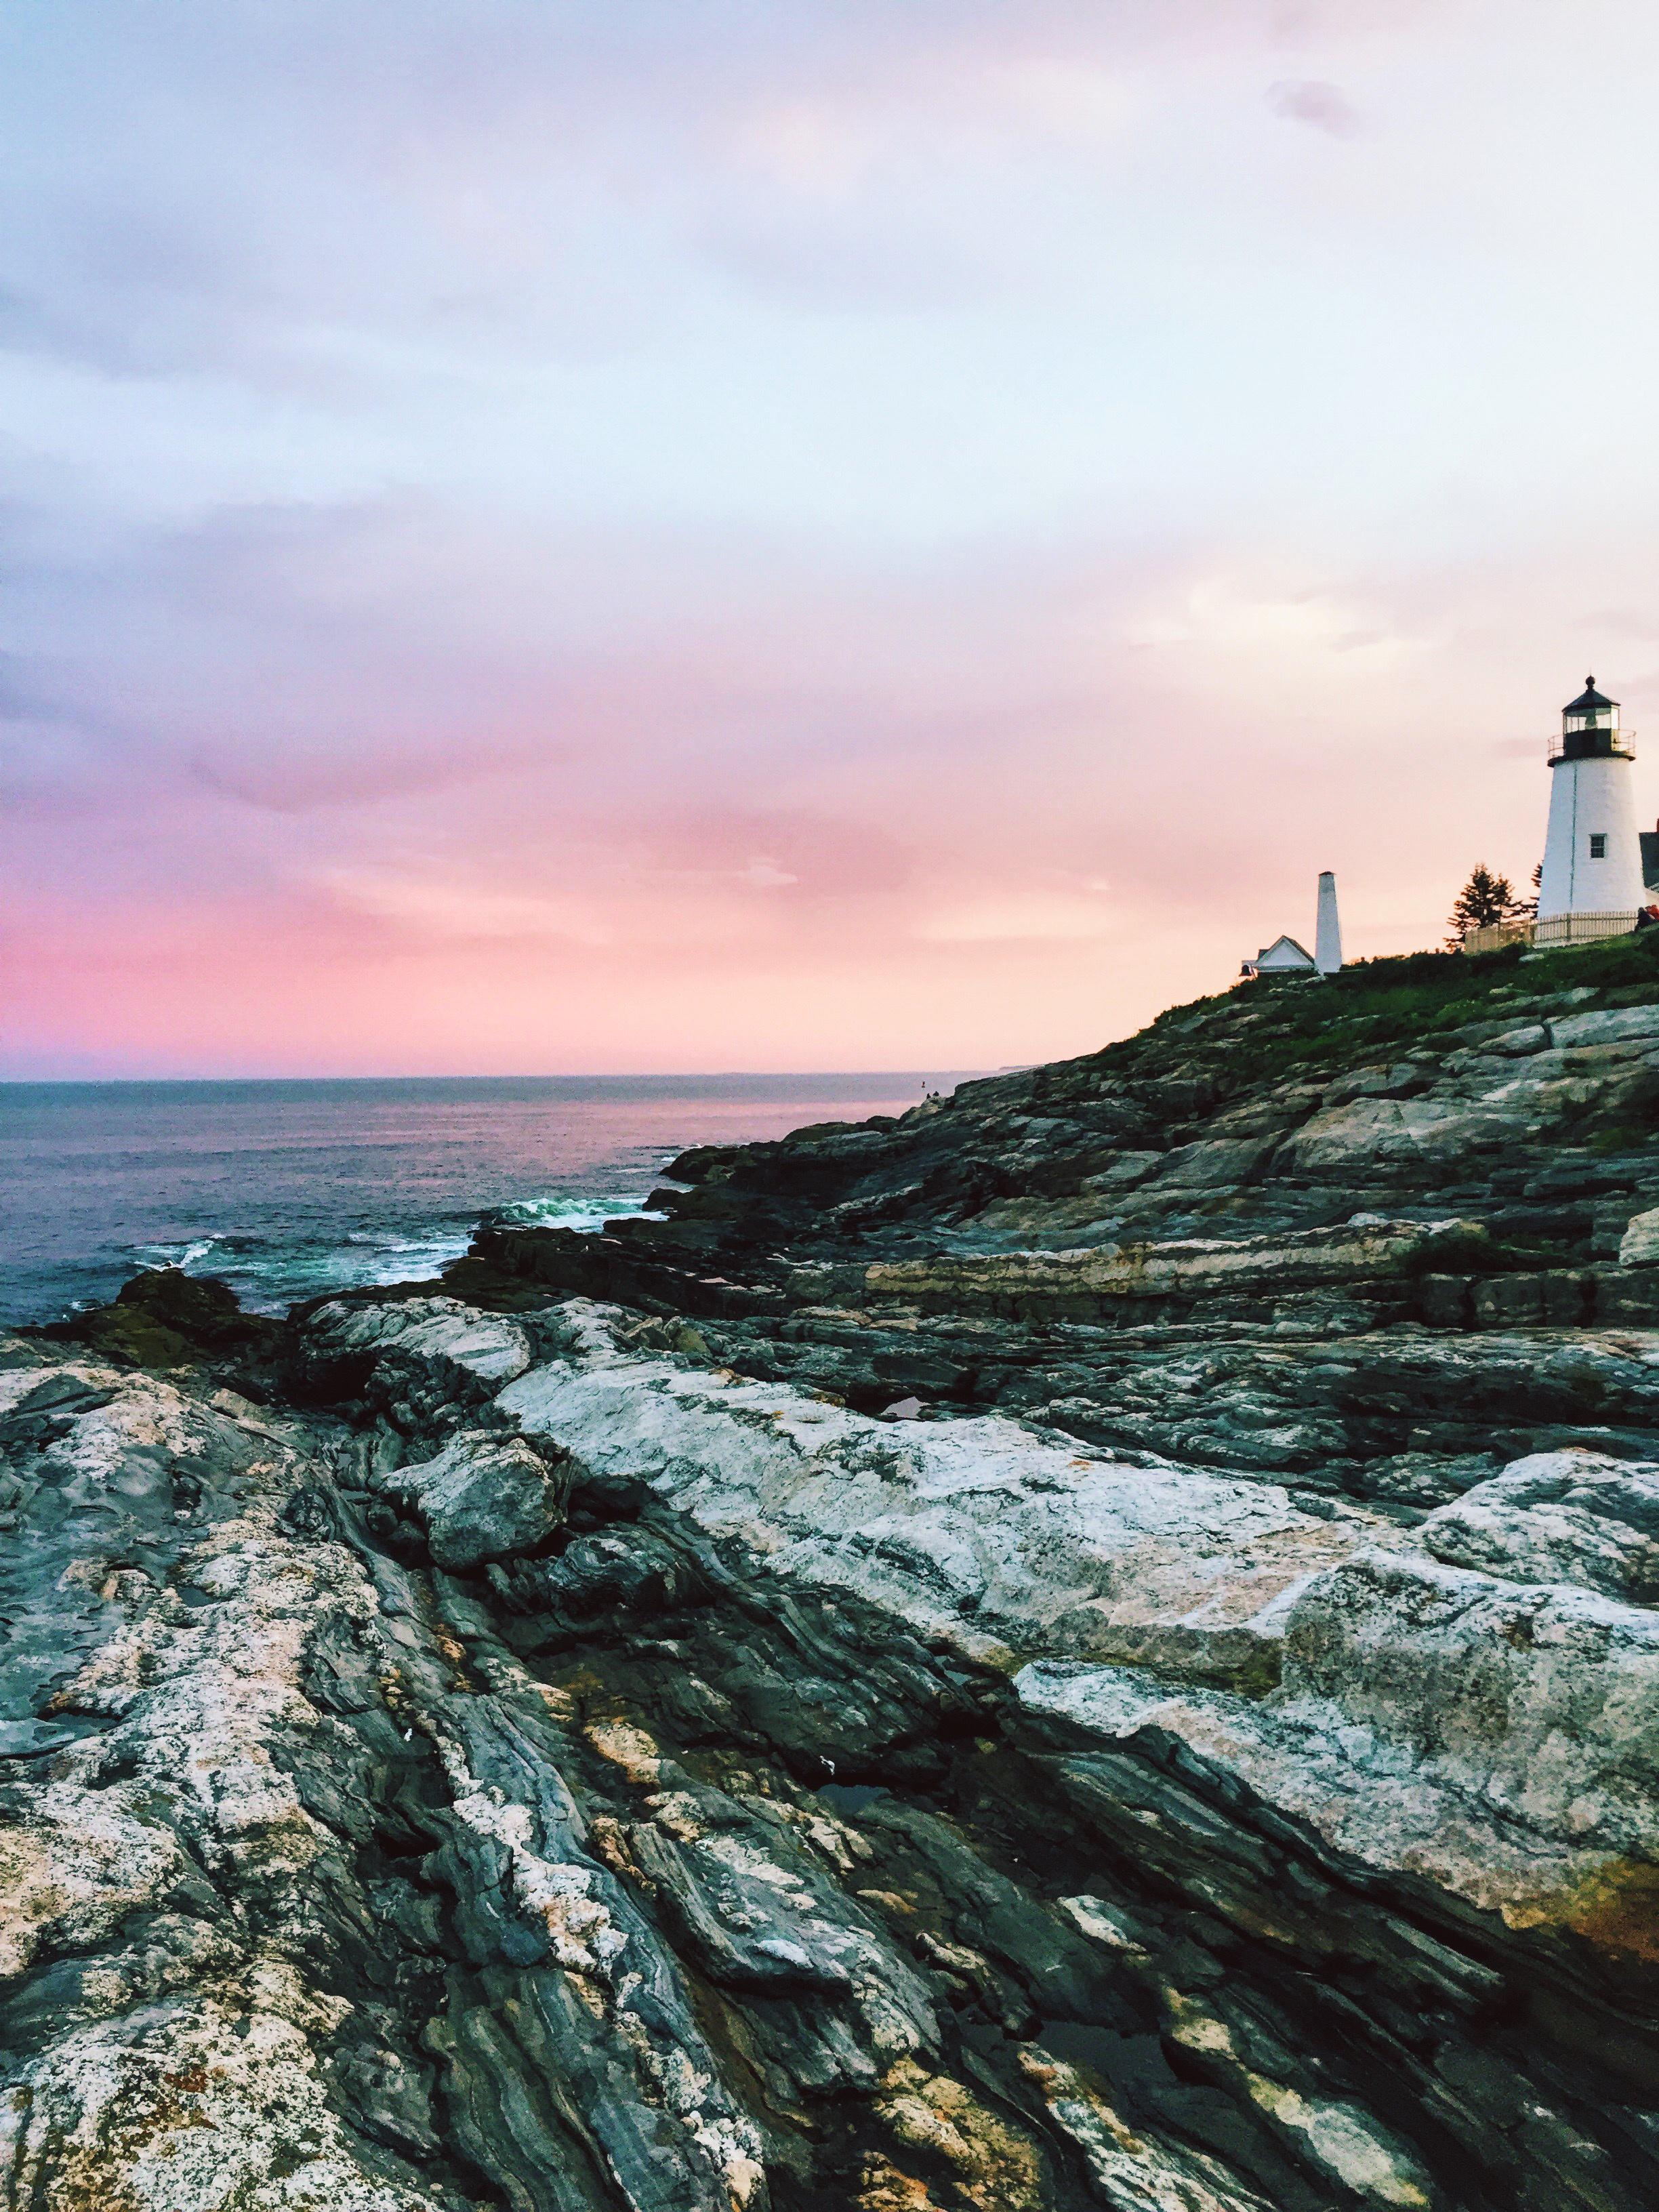 Blogging Journey   Creative Entrepreneur   Summer In Maine   Travel Blogger   Maine Lighthouse   Coast of Maine   Sunset over the Ocean   Photo Inspiration via @elanaloo + elanaloo.com